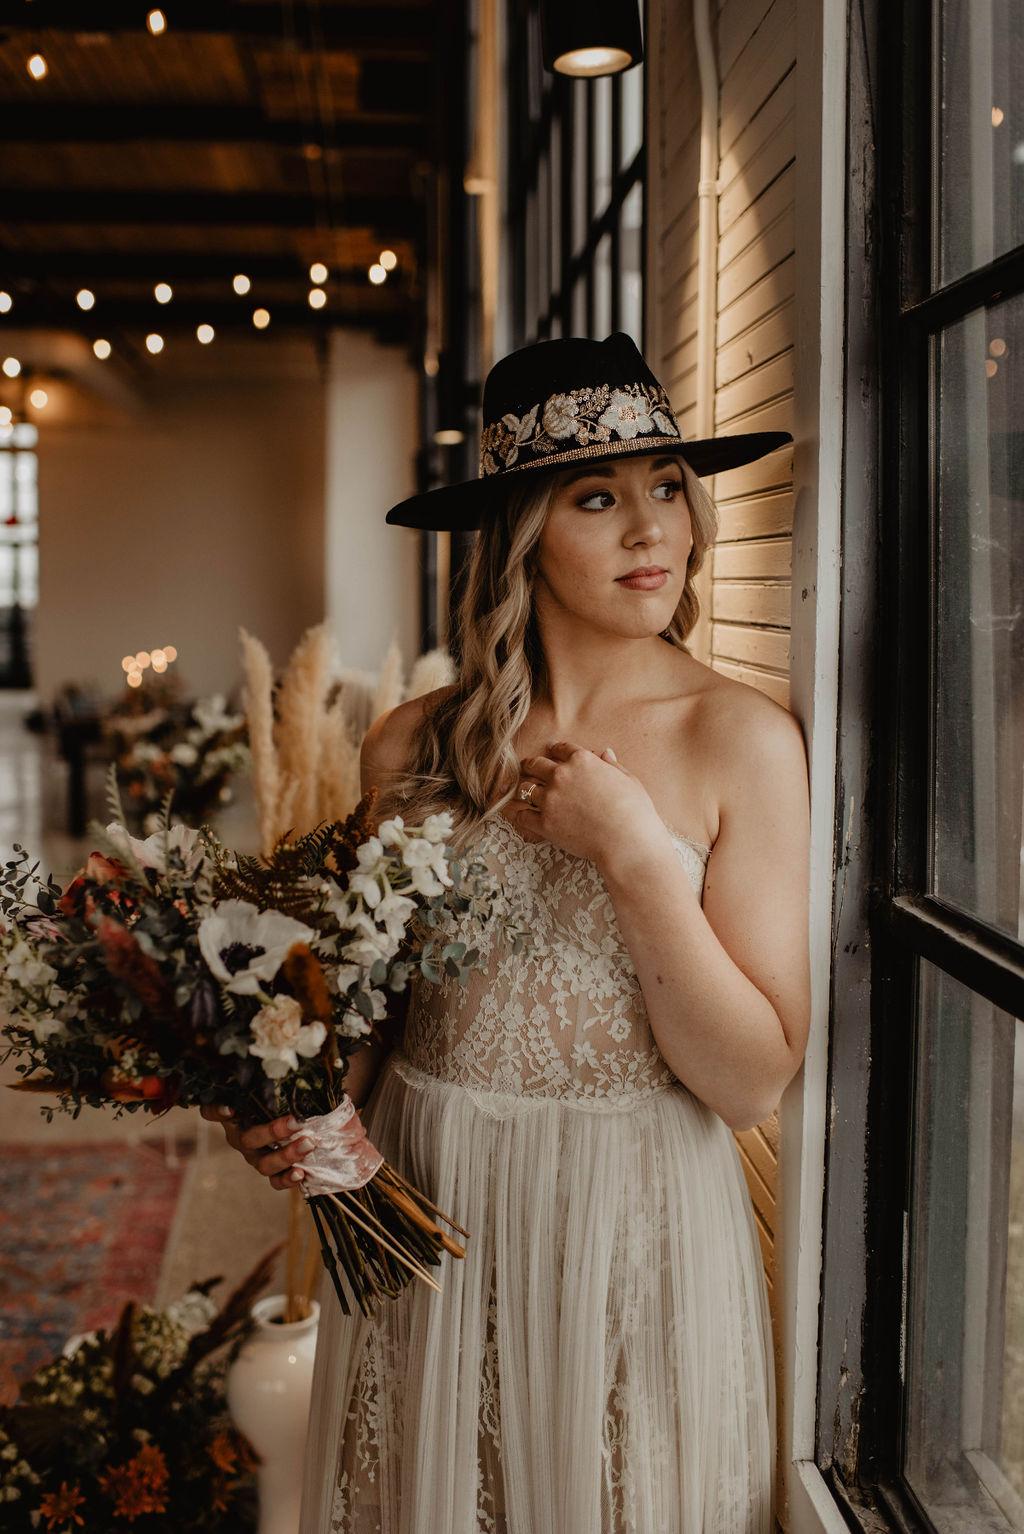 Boho Bride | Nashville Bride Guide